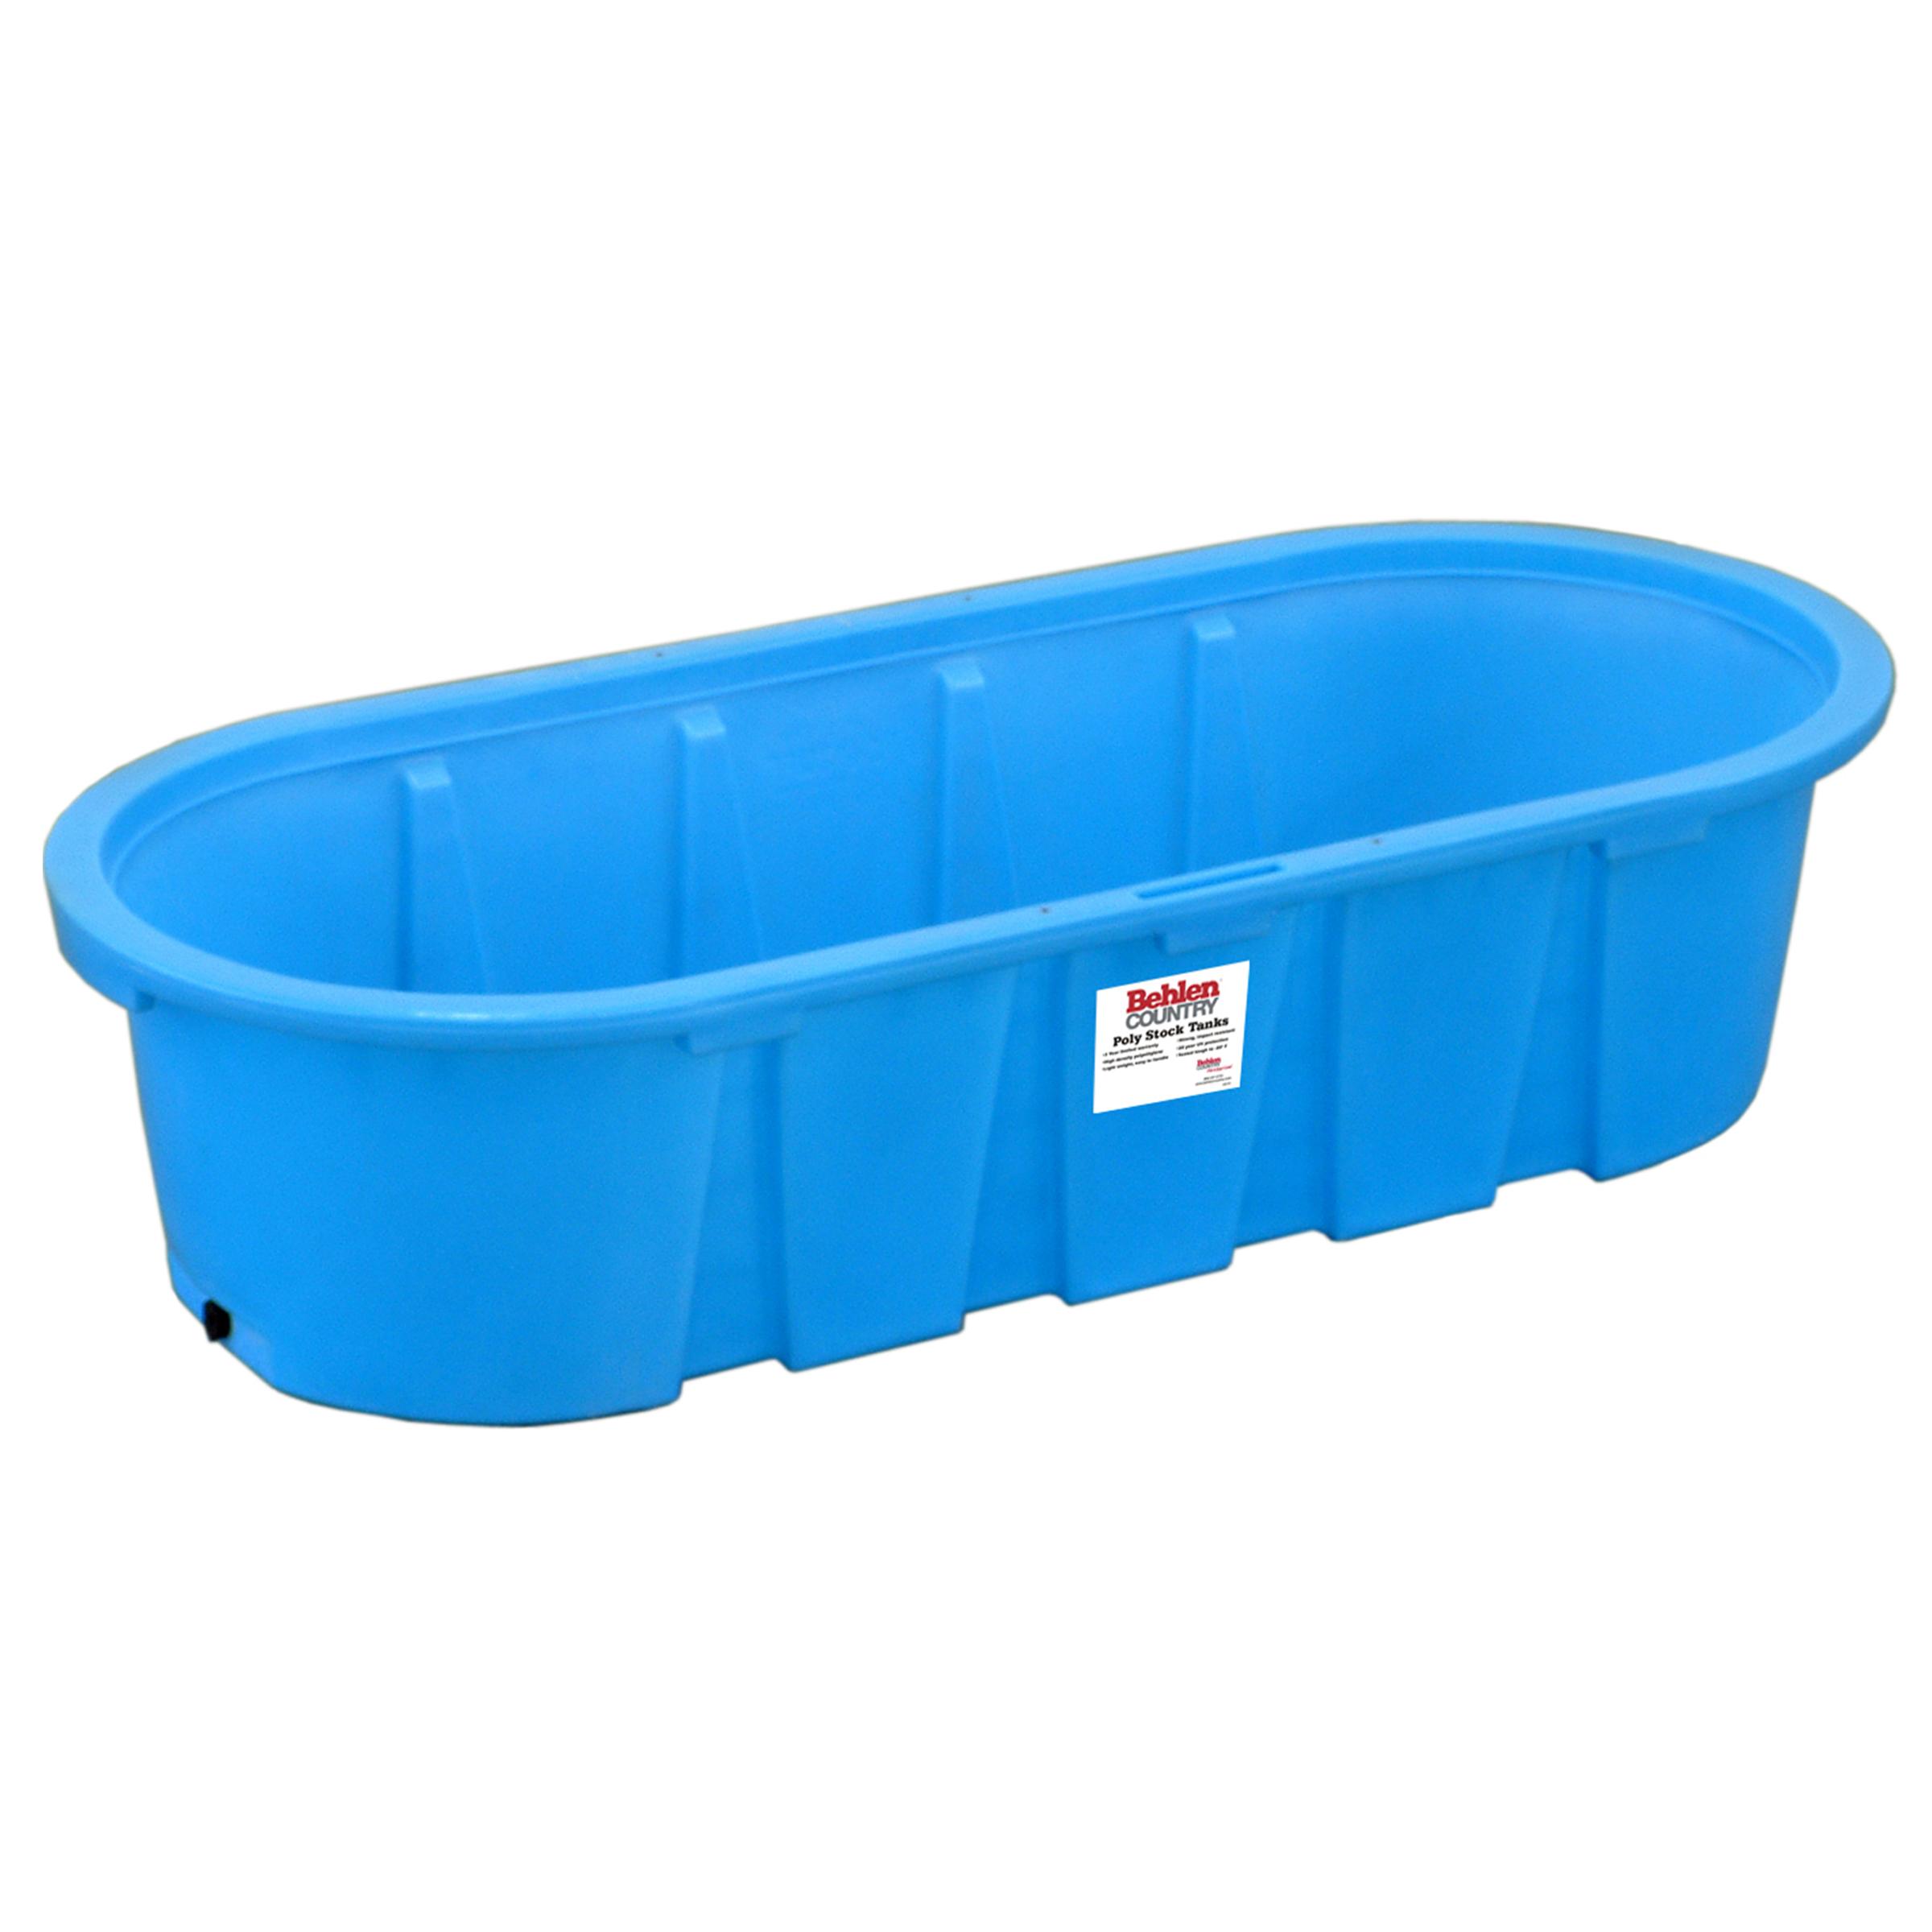 Bath Tubs For Sale In Kenya